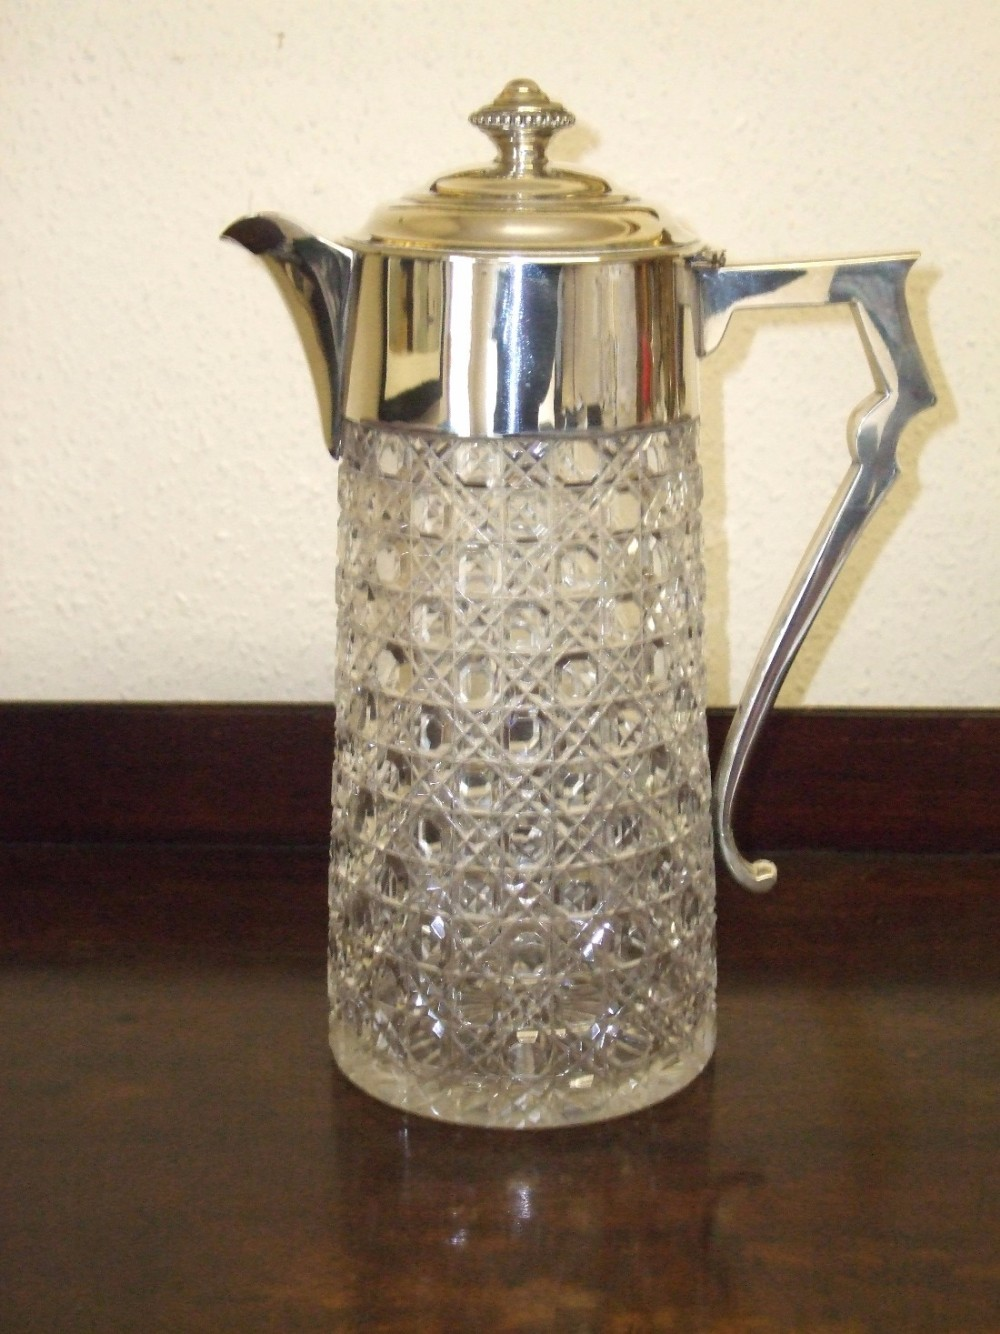 hobnail cut crystal silver mounted claretjug c1894 london hallmarks